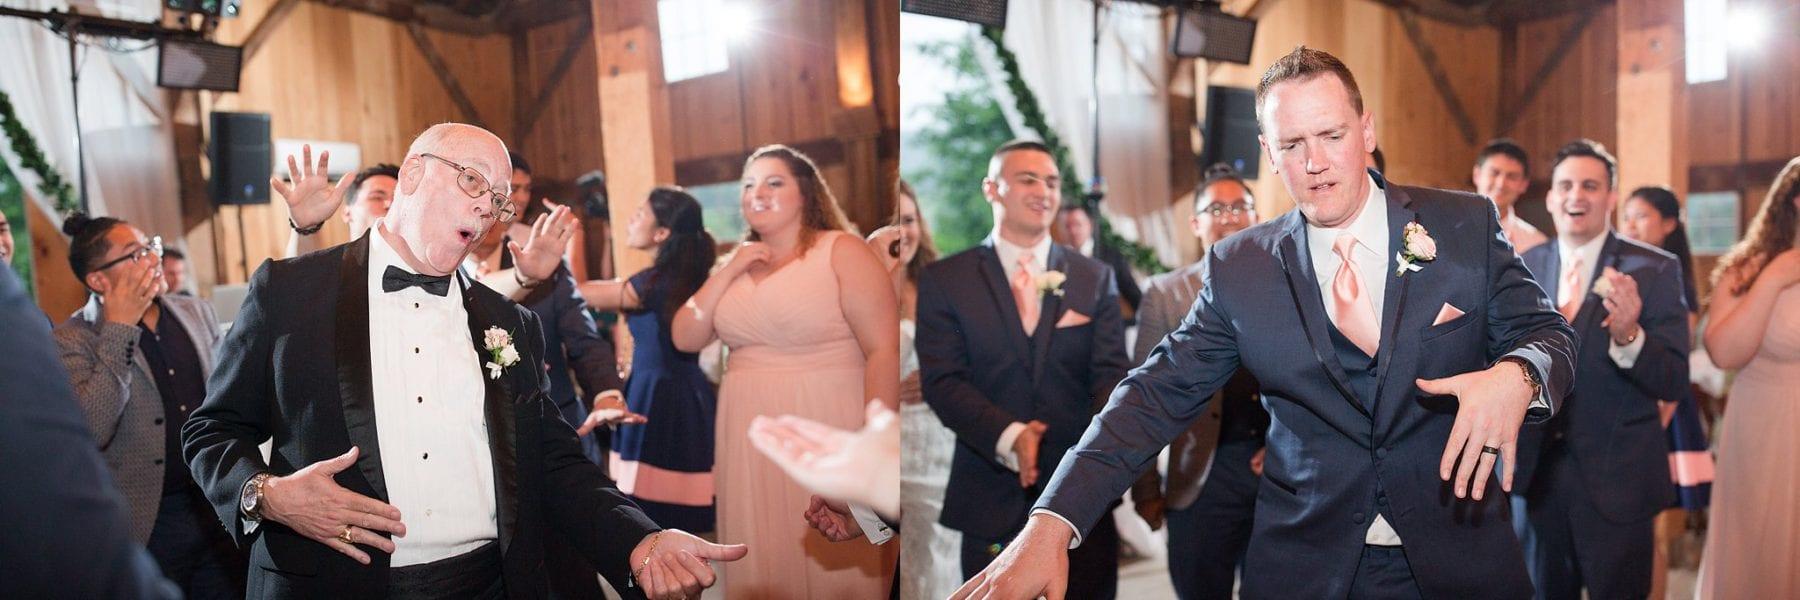 Justin & Megan Big Spring Farm Wedding Photos-501.jpg